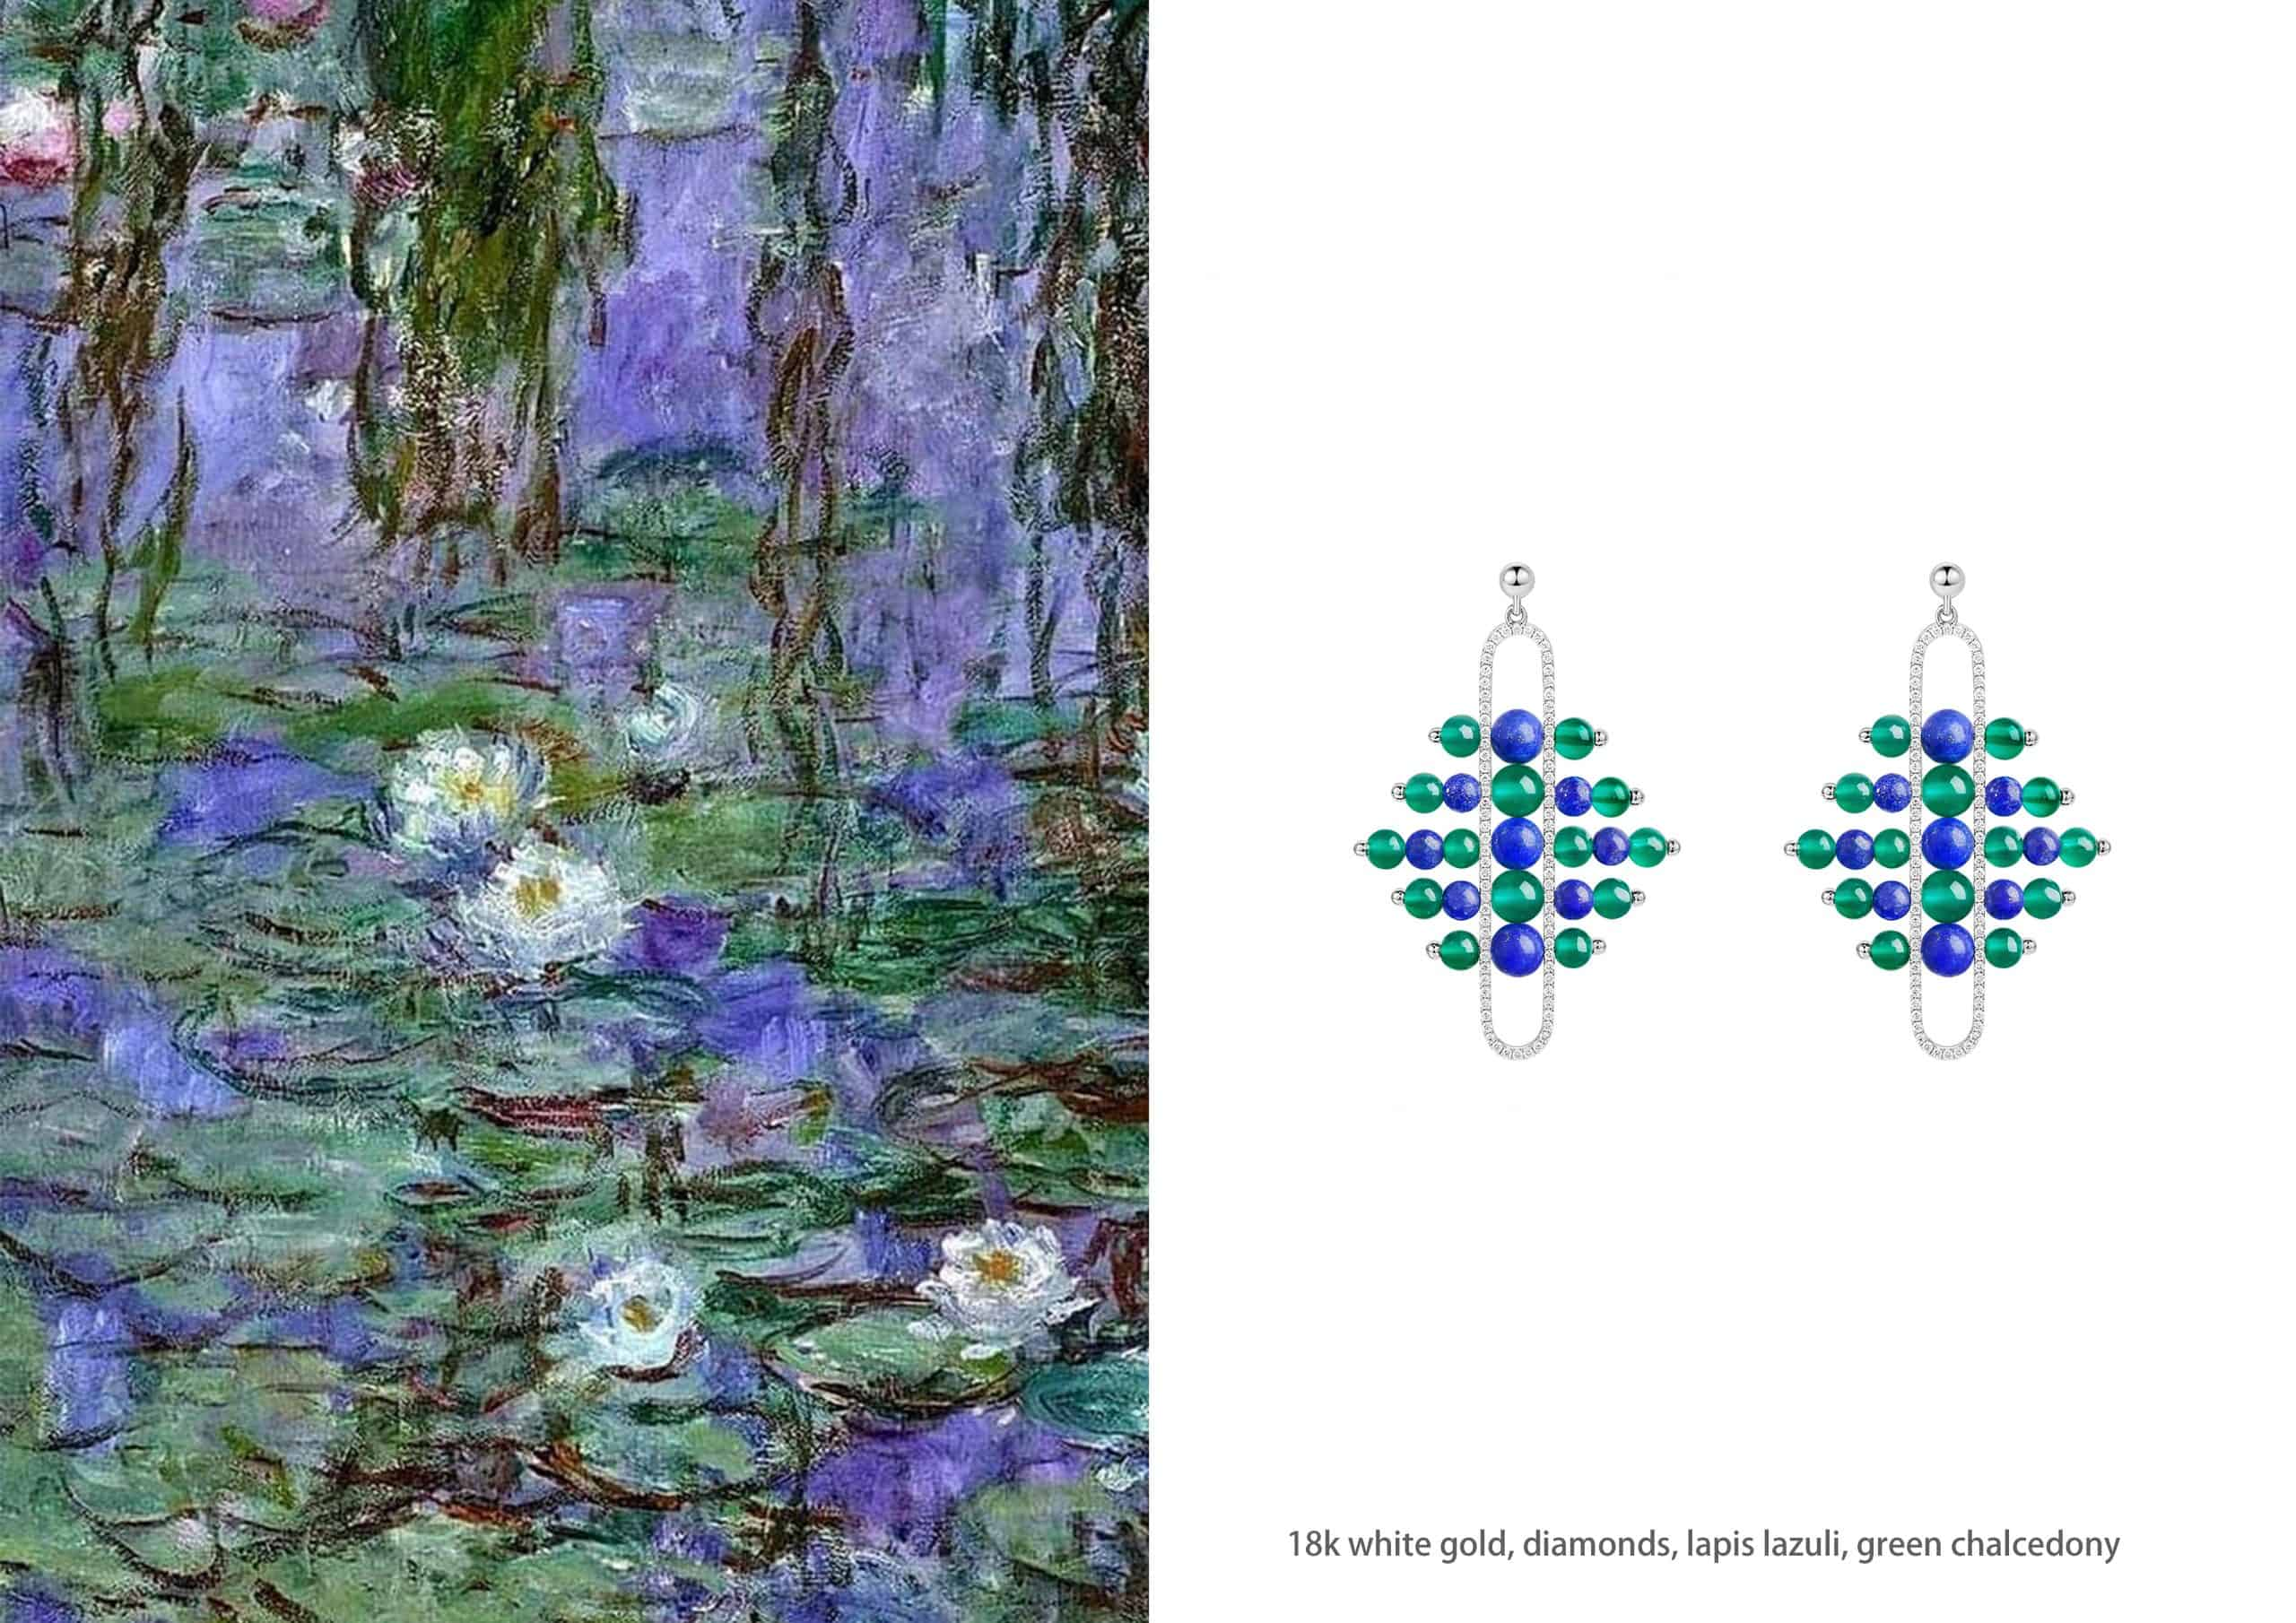 18kt White Gold Lapis Lazuli,Aquamarine,blue, green and yellow Chalcedony, Akoya Pearl